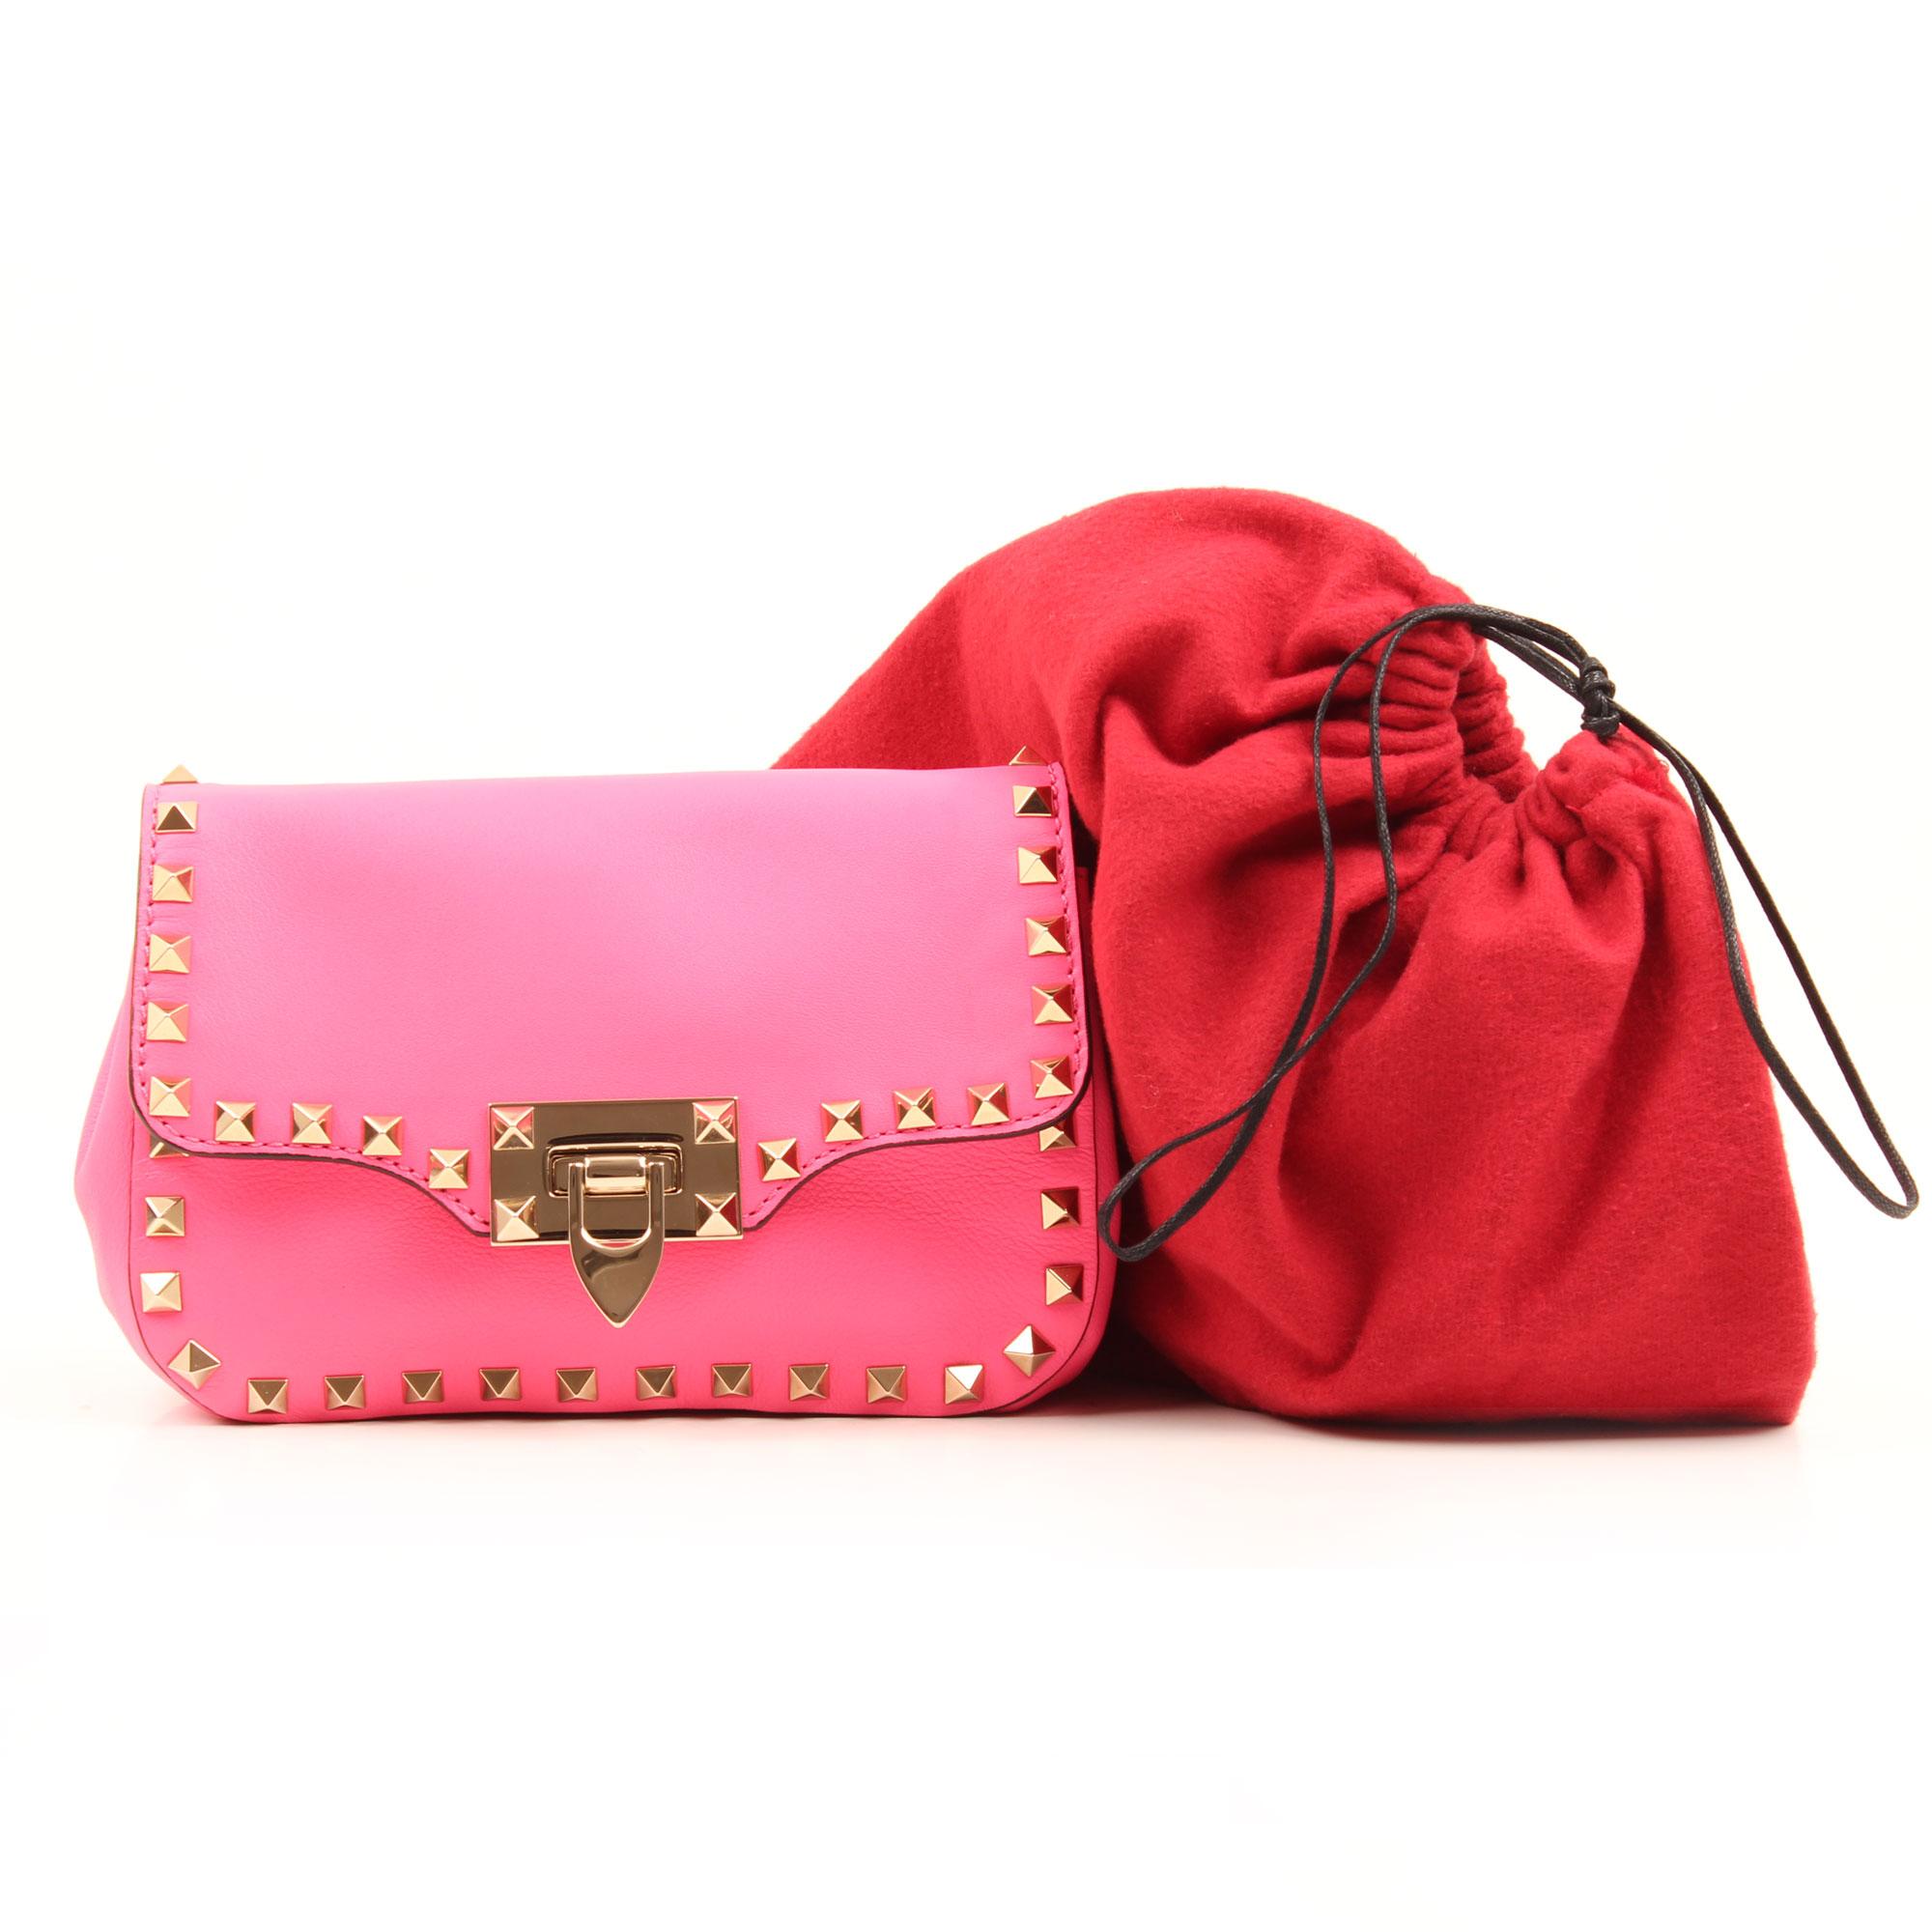 Imagen del dustbag bolso valentino mini rockstud rosa